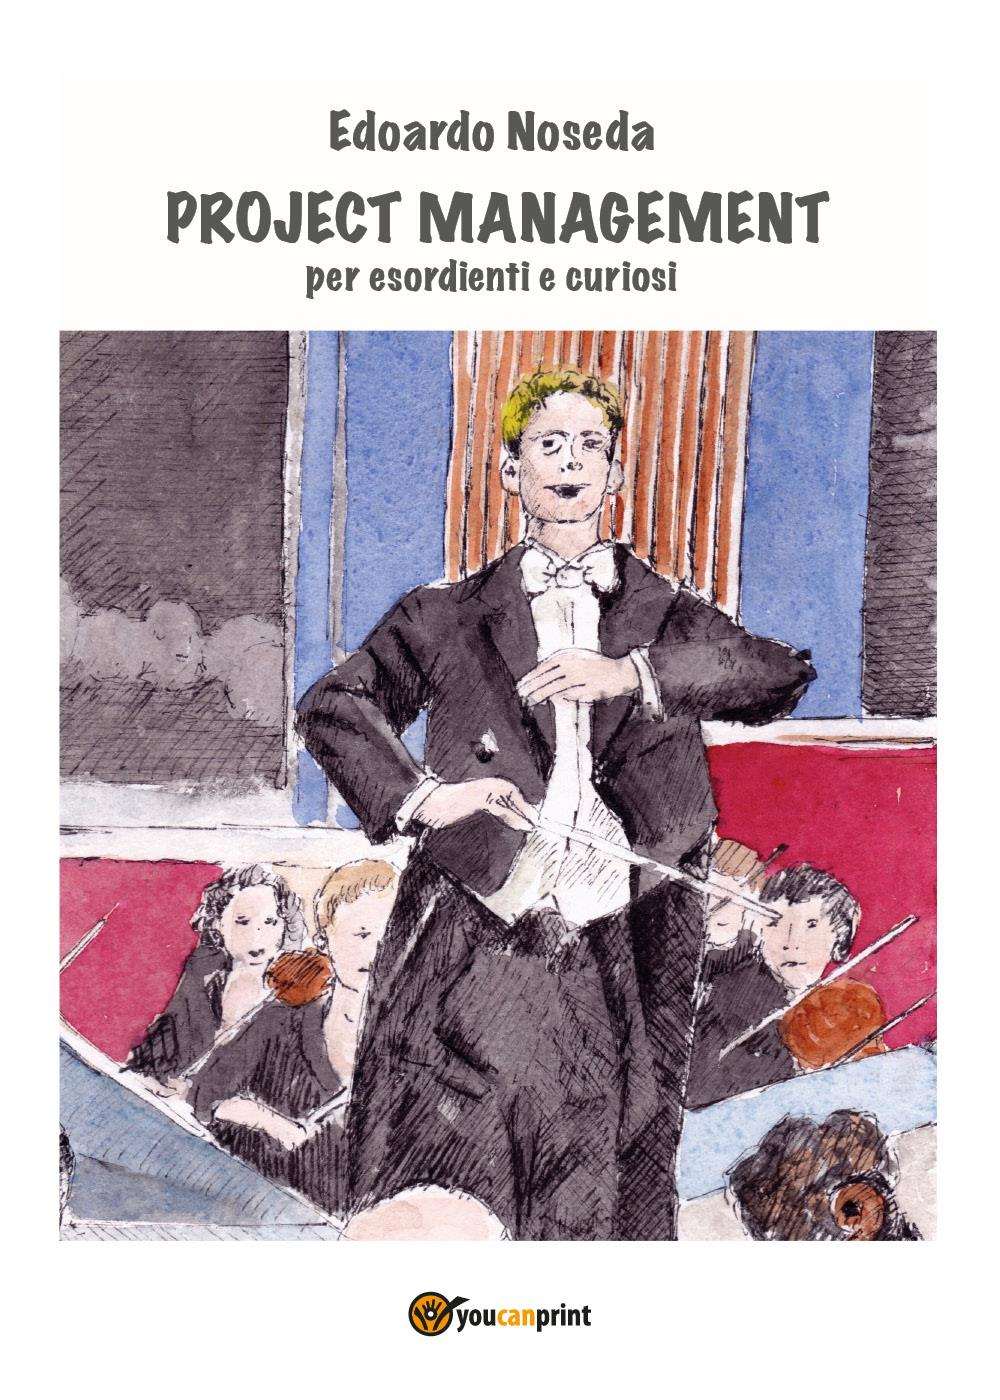 Project Management per esordienti e curiosi